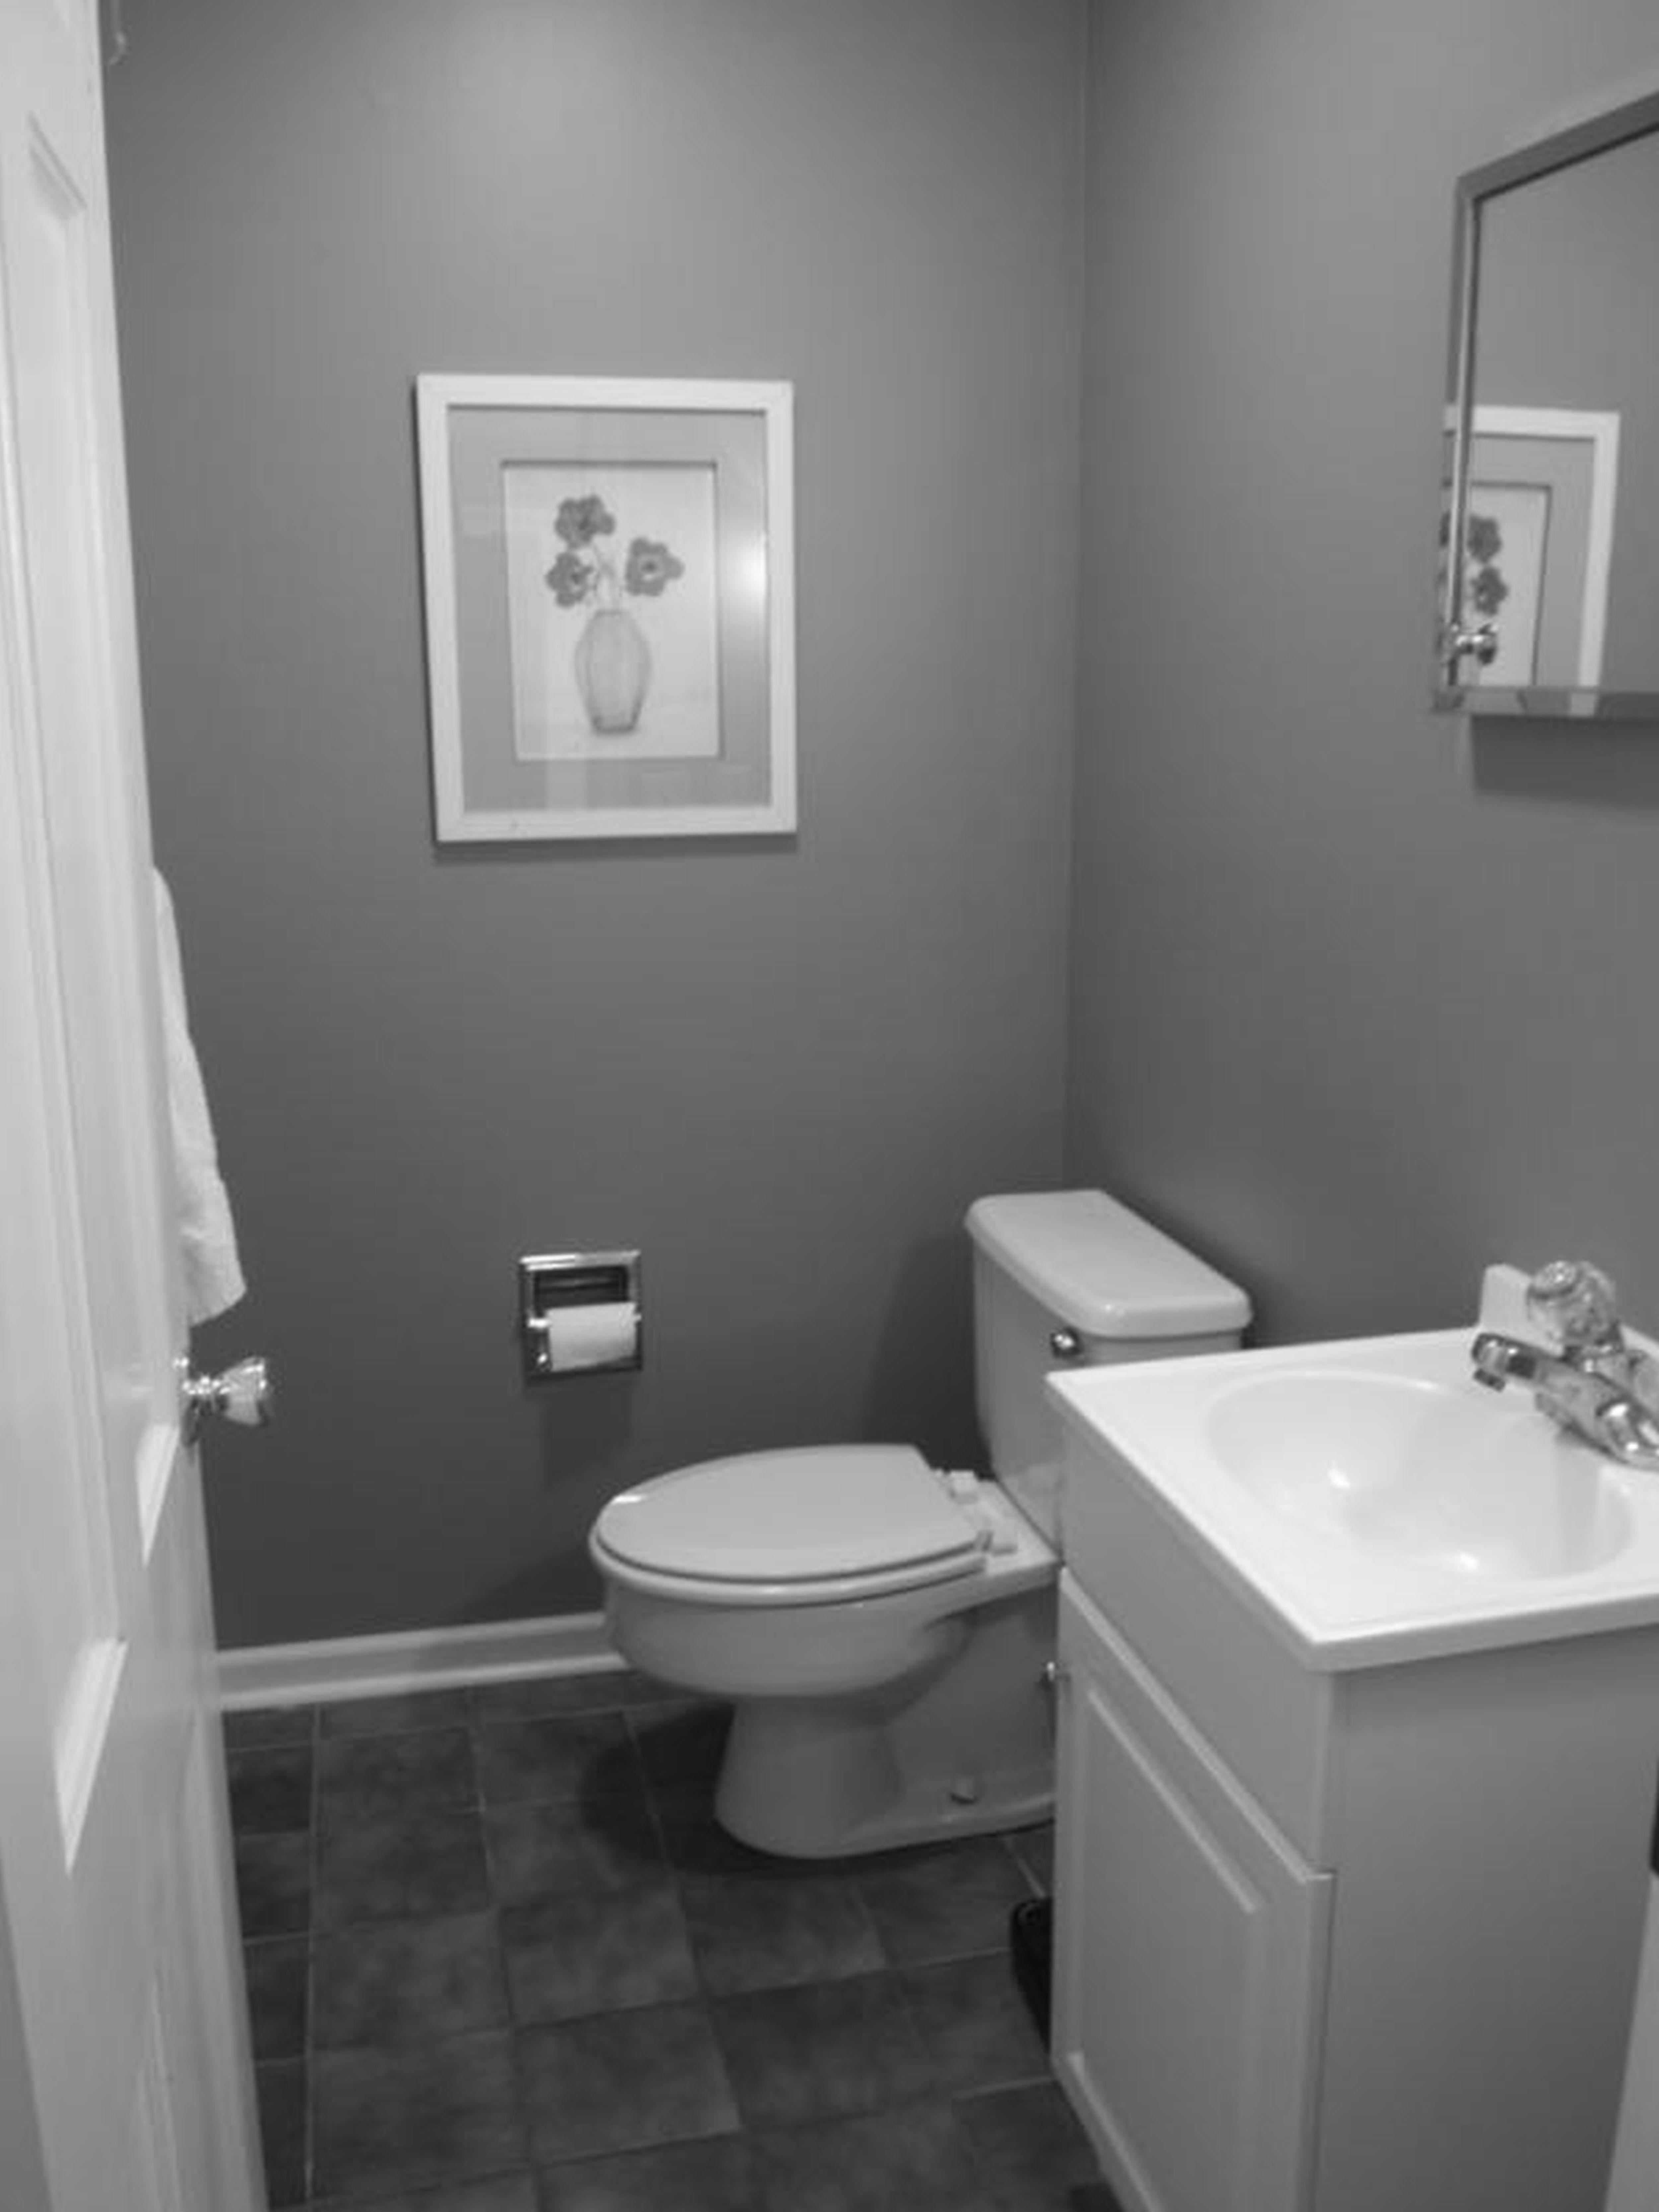 best bathroom wall storage cabinets ideas-Latest Bathroom Wall Storage Cabinets Décor